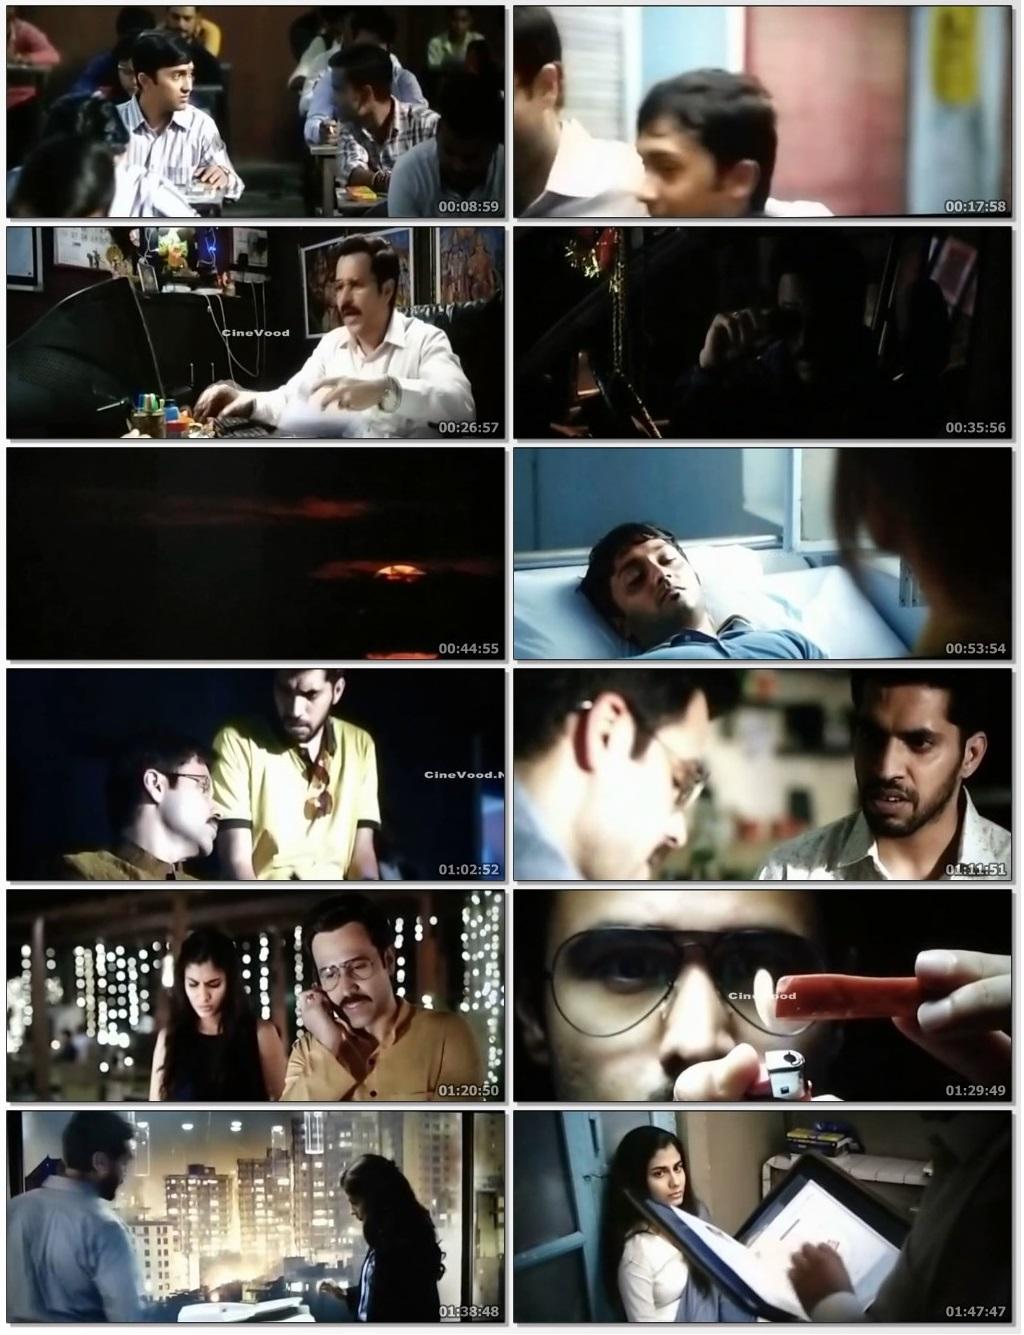 Why-Cheat-India-2019-Hindi-PreDvDRip-700MB-CiNEVooD-Exclusive Why Cheat India (2019) Full Movie Download 300MB 480P PDVD HD Free Hindi